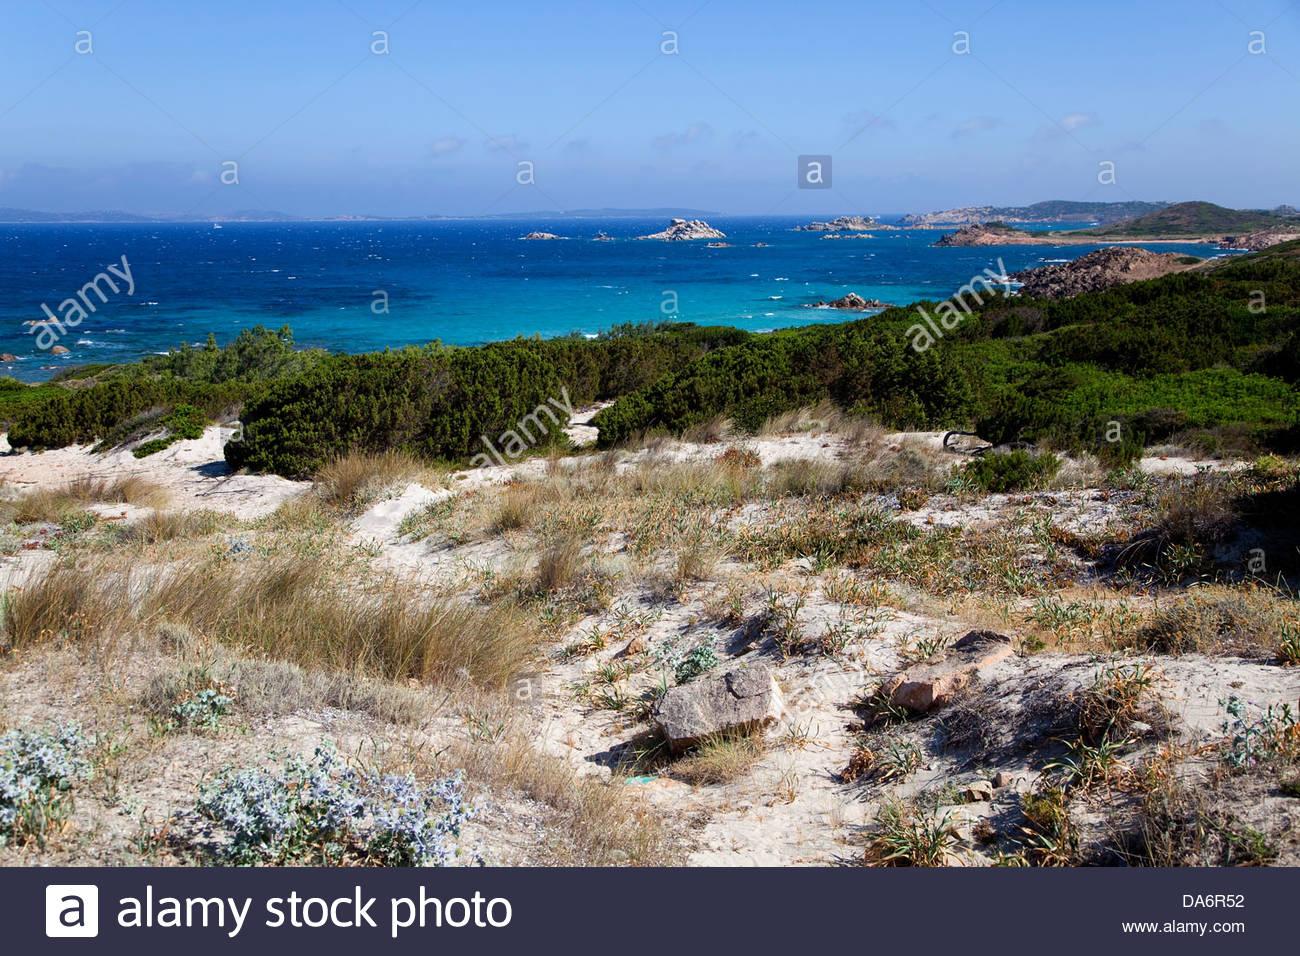 Coastline near Baia Trinità,Sardinia,Italy - Stock Image